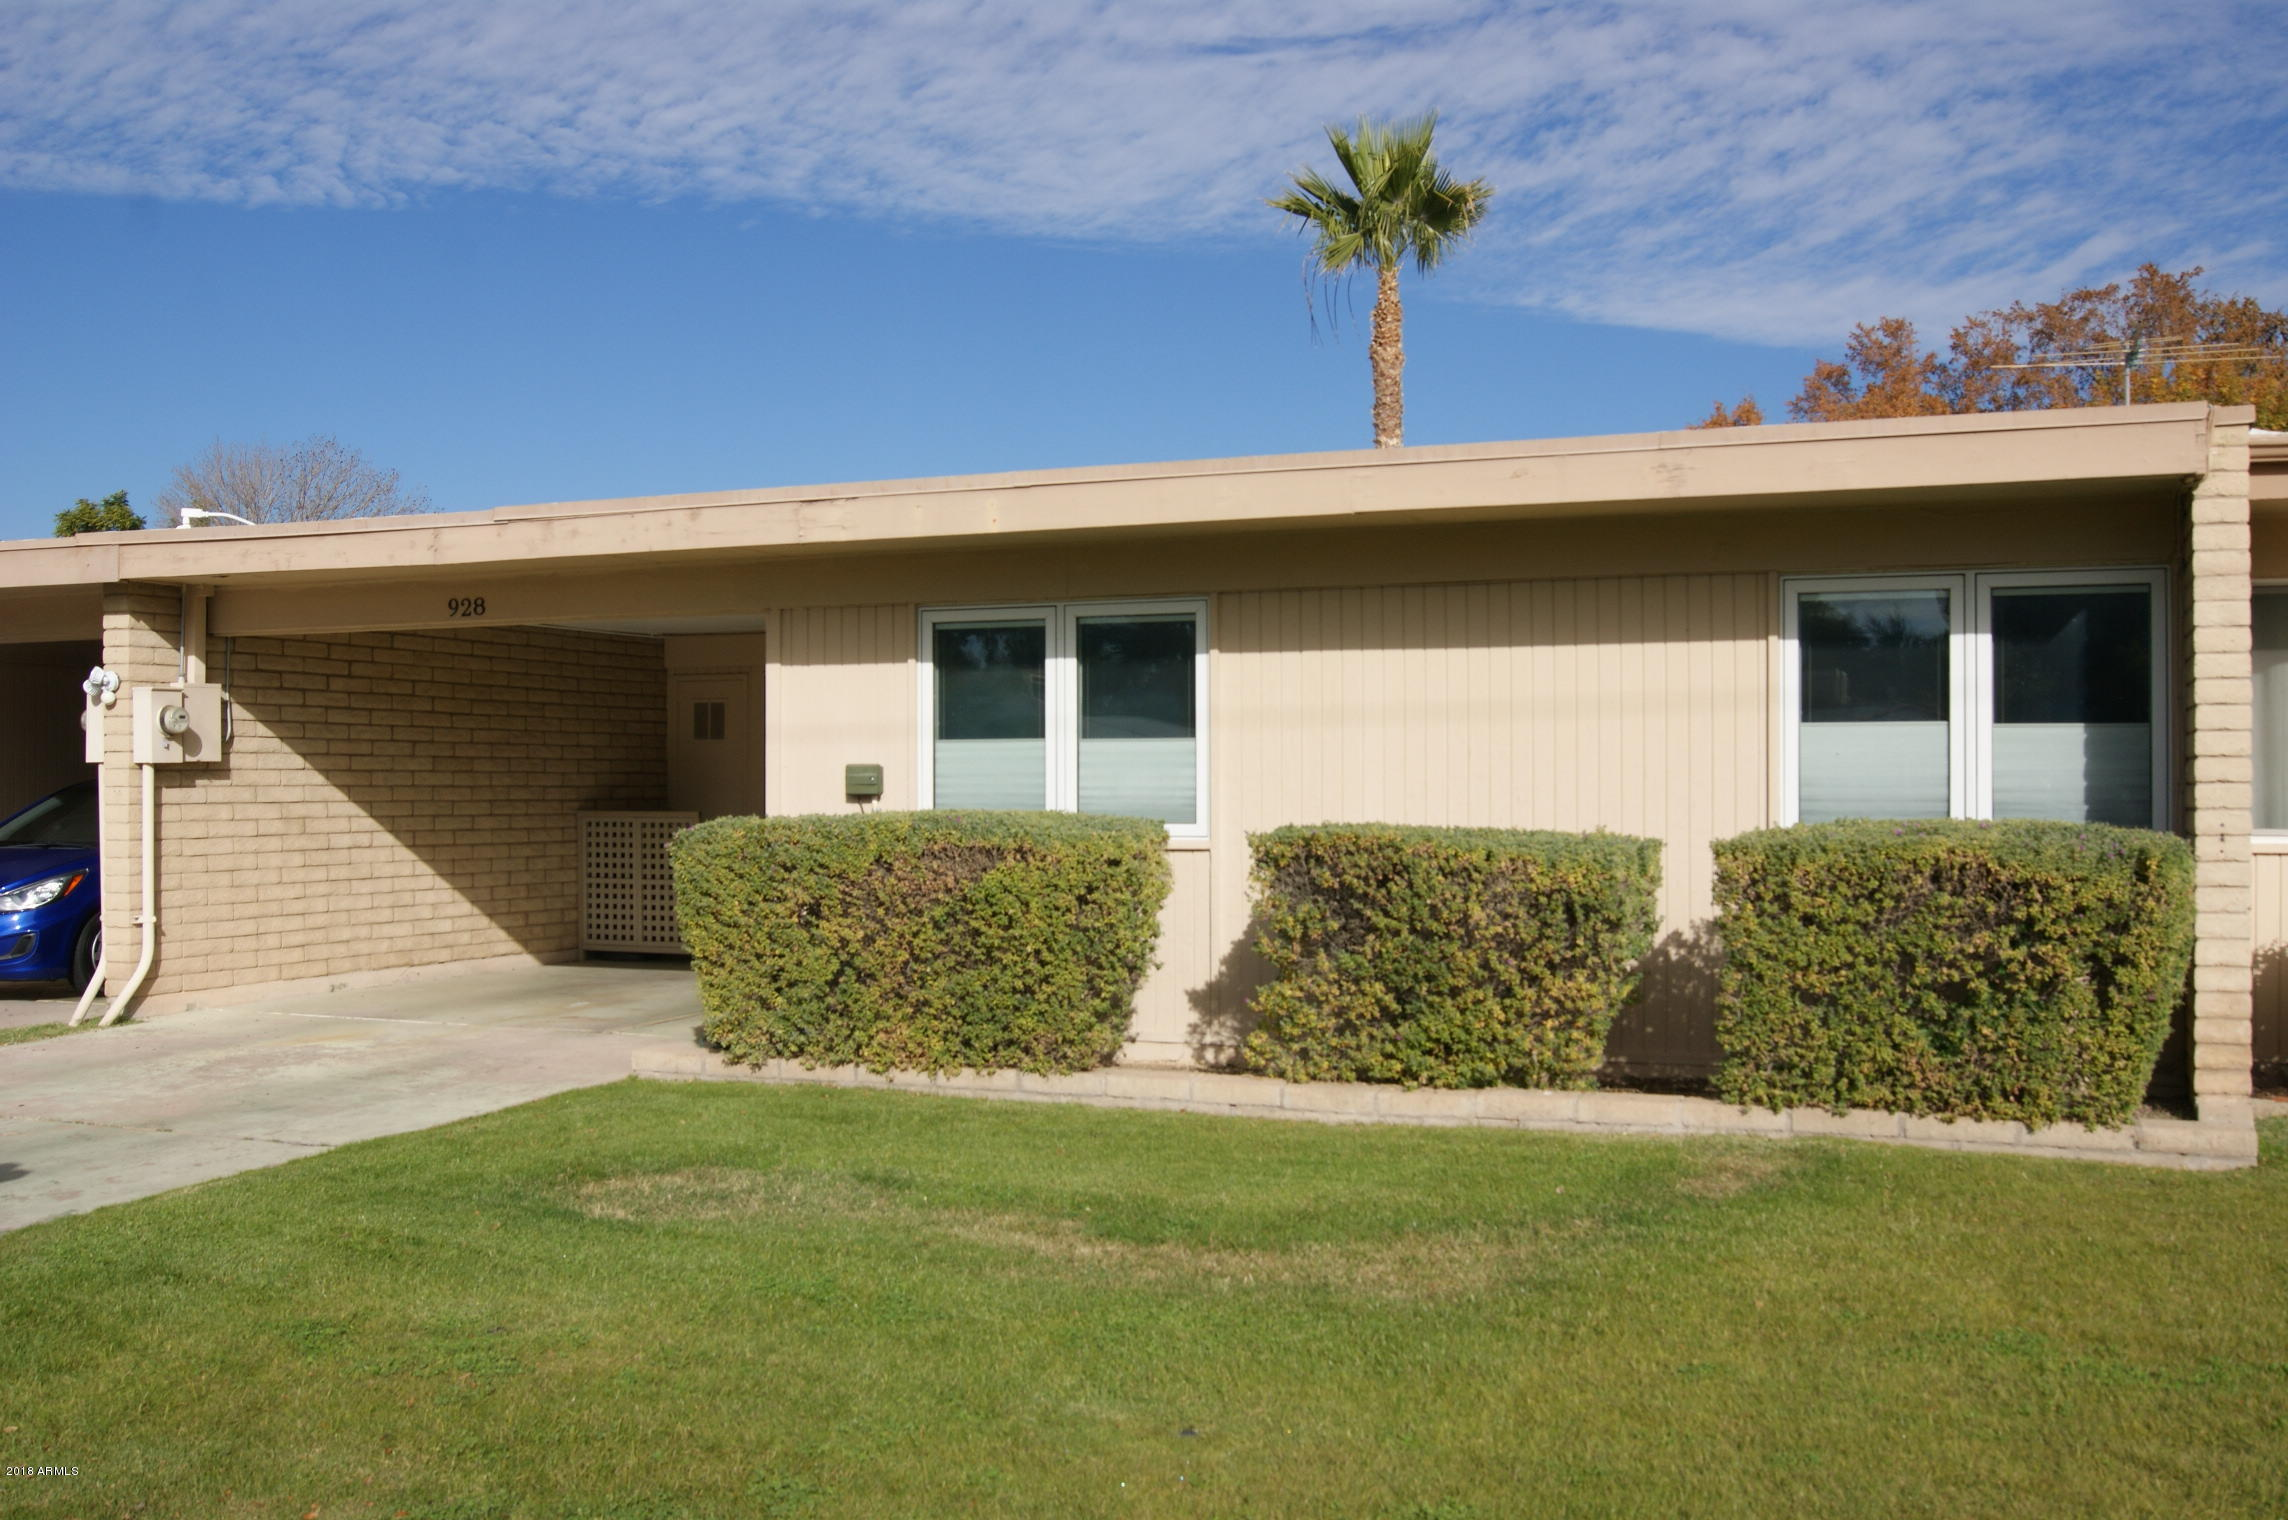 Photo of 928 E MISSOURI Avenue, Phoenix, AZ 85014